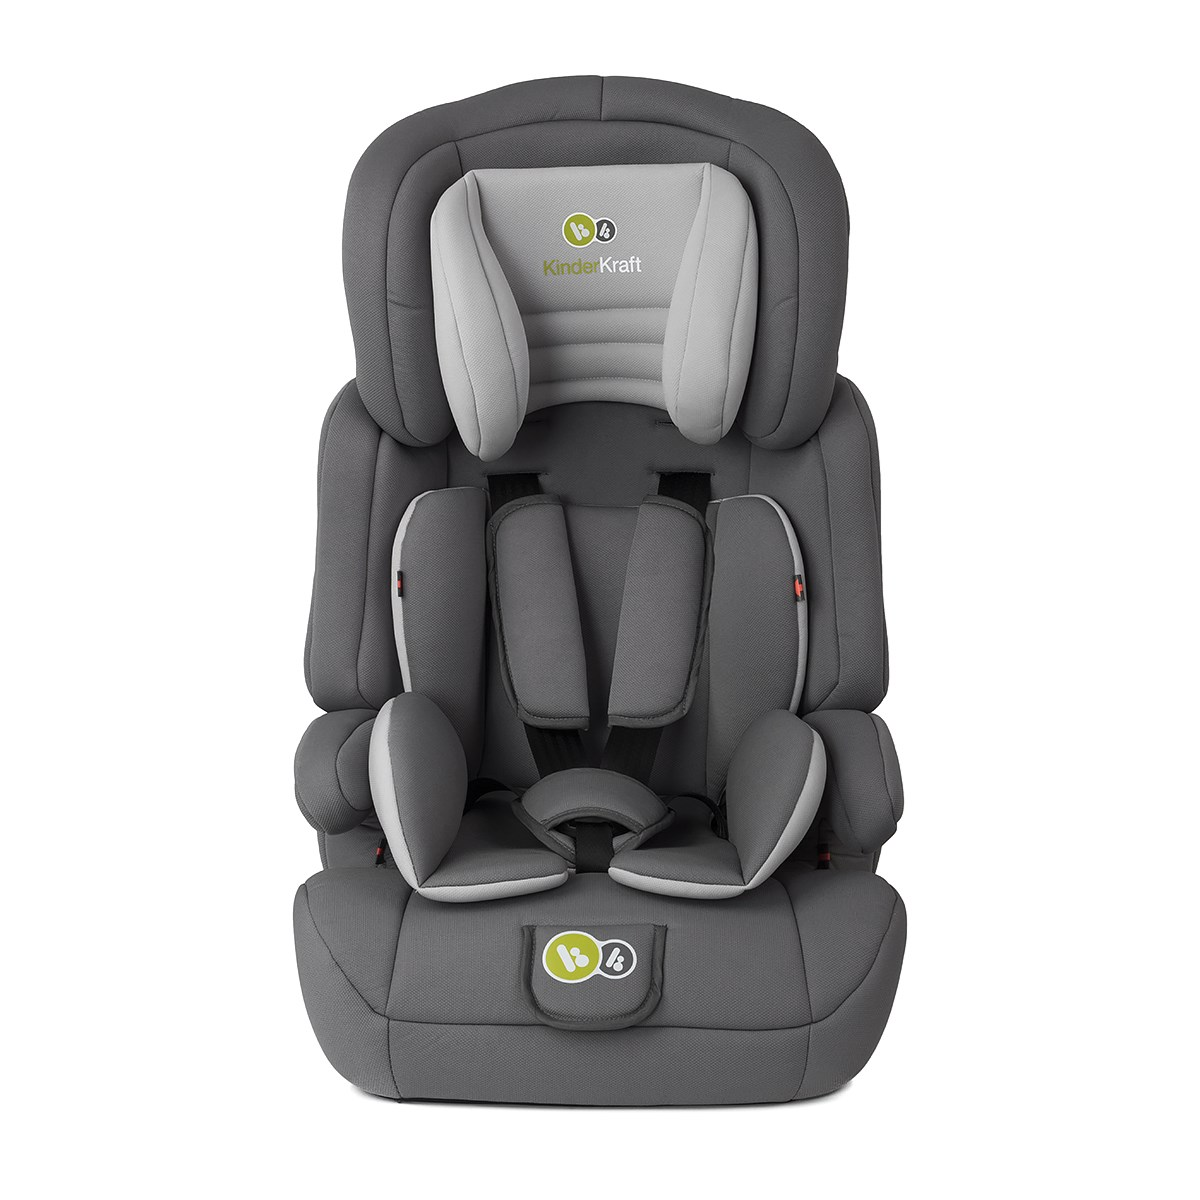 autokindersitz autositz kindersitz kinderkraft comfort up. Black Bedroom Furniture Sets. Home Design Ideas